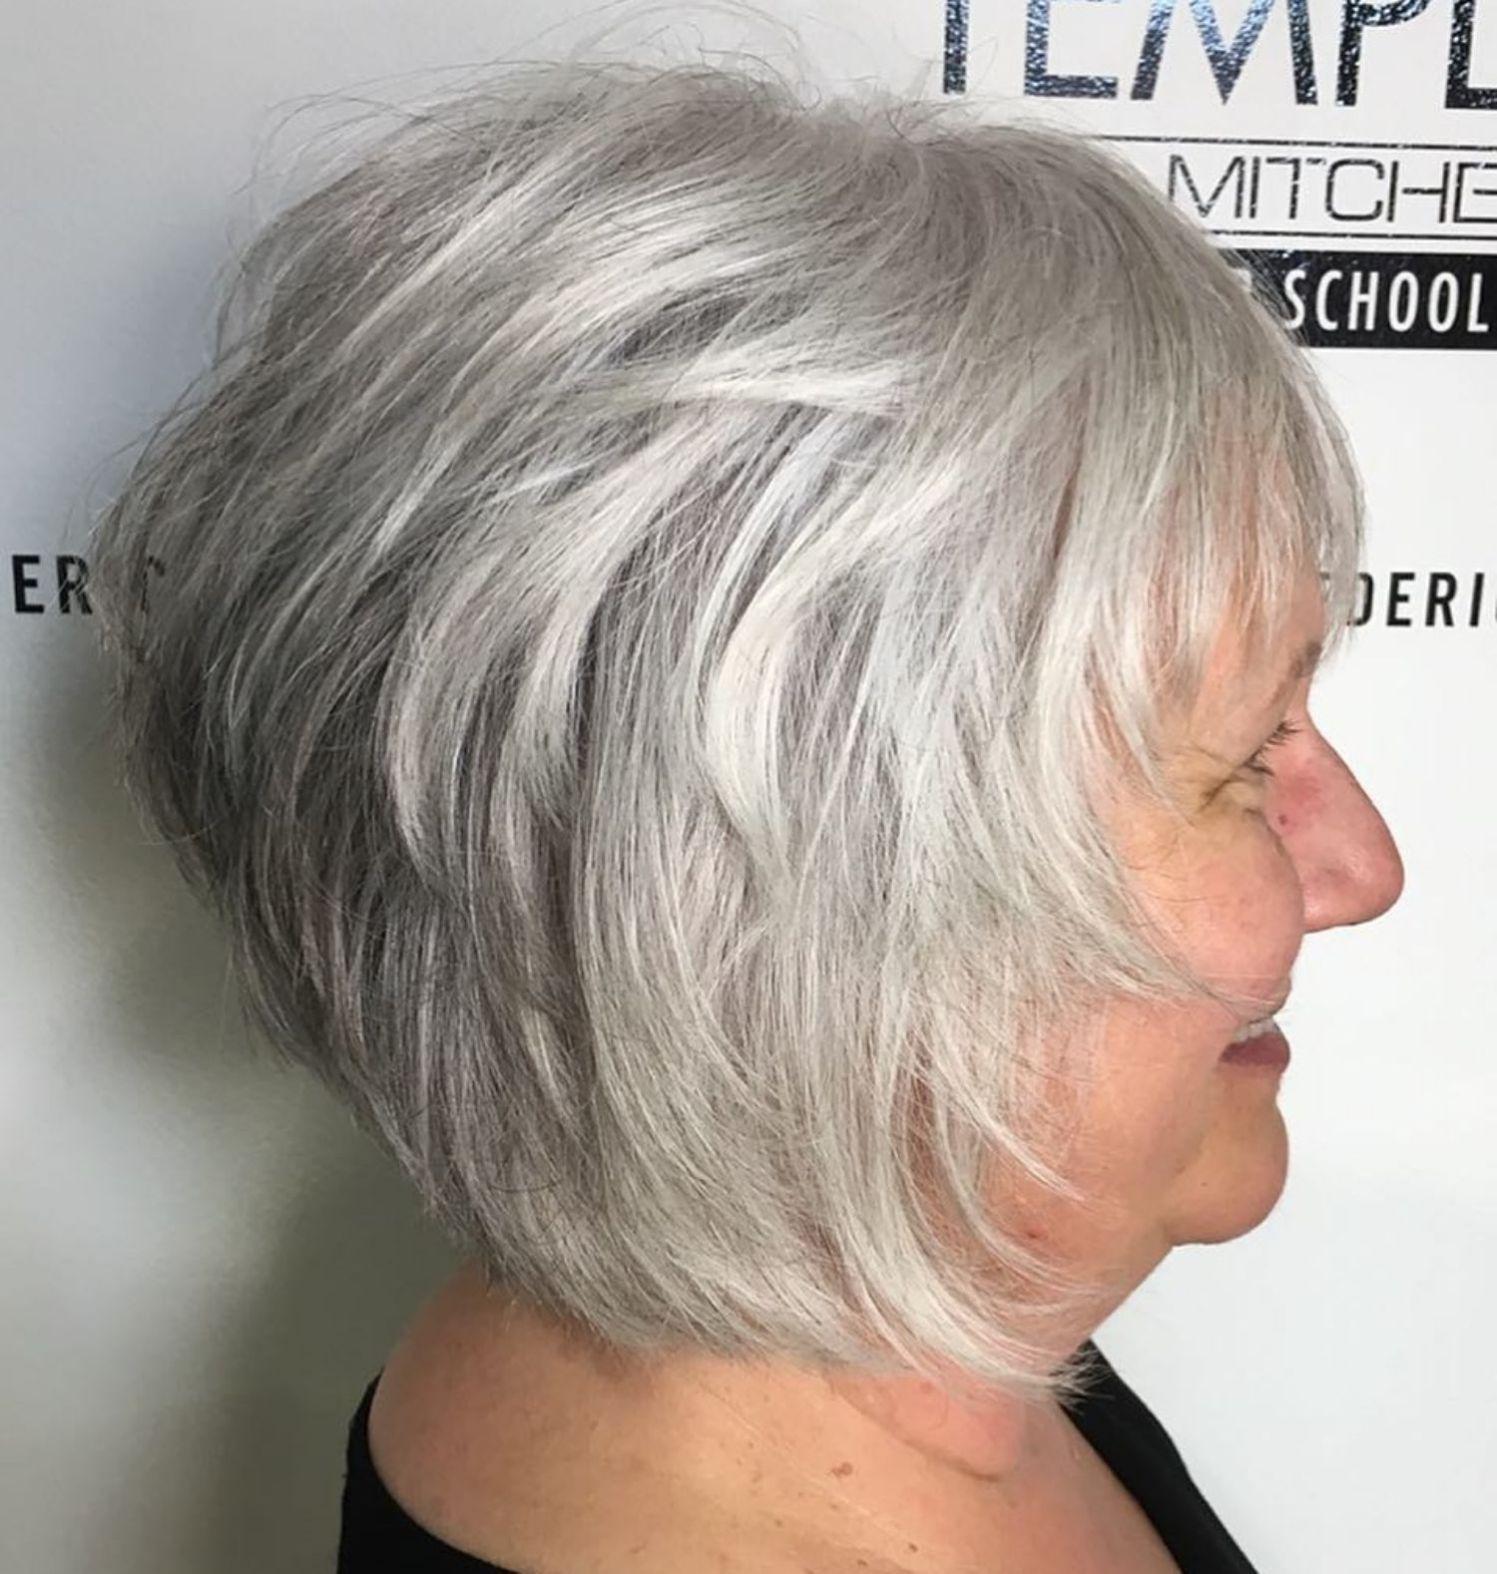 65 Gorgeous Gray Hair Styles In 2020 Gorgeous Gray Hair Grey Bob Hairstyles Grey Hair Styles For Women